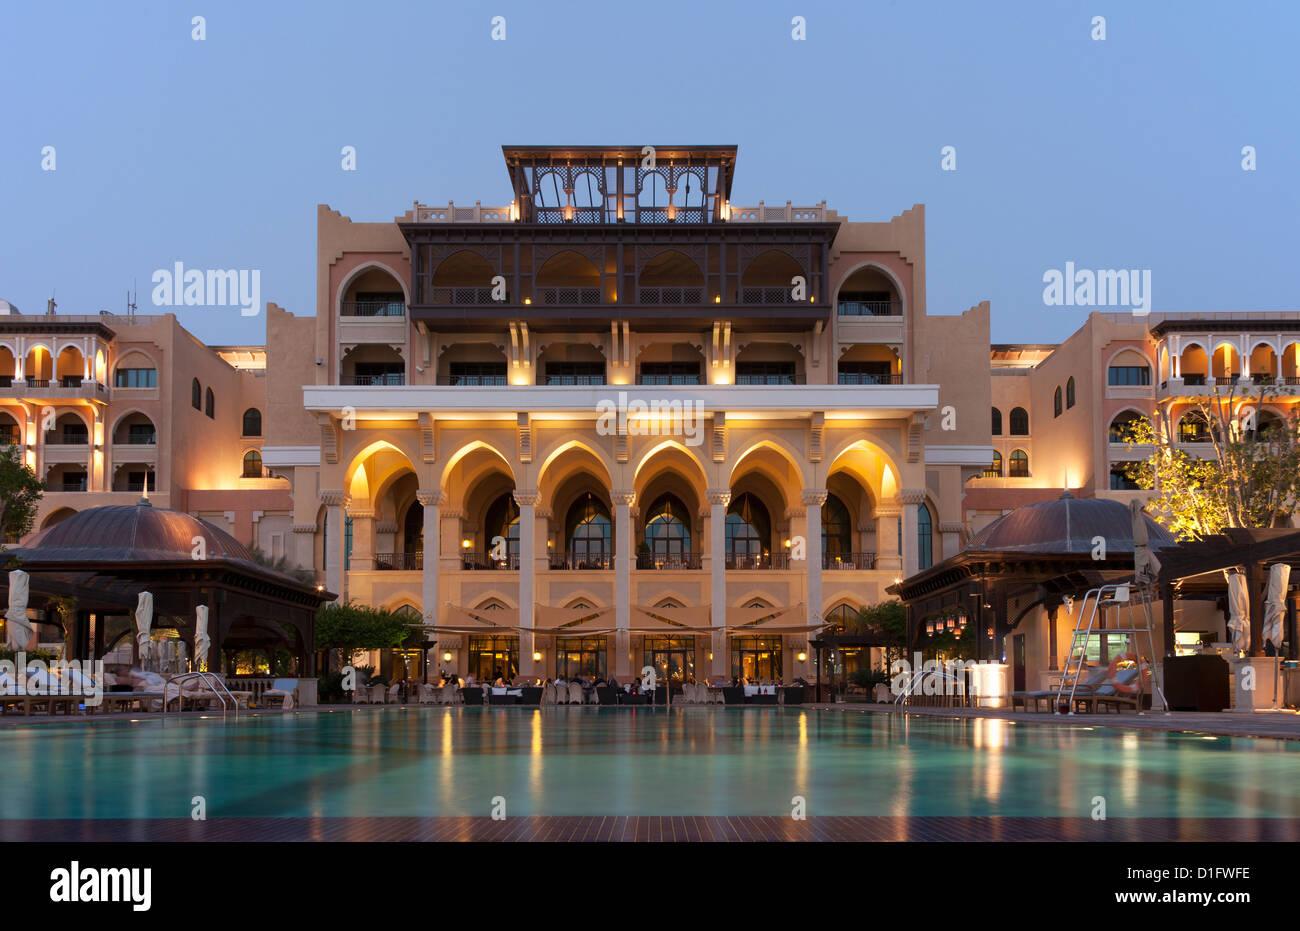 Shangri La Hotel di Abu Dhabi, Emirati Arabi Uniti, Medio Oriente Immagini Stock